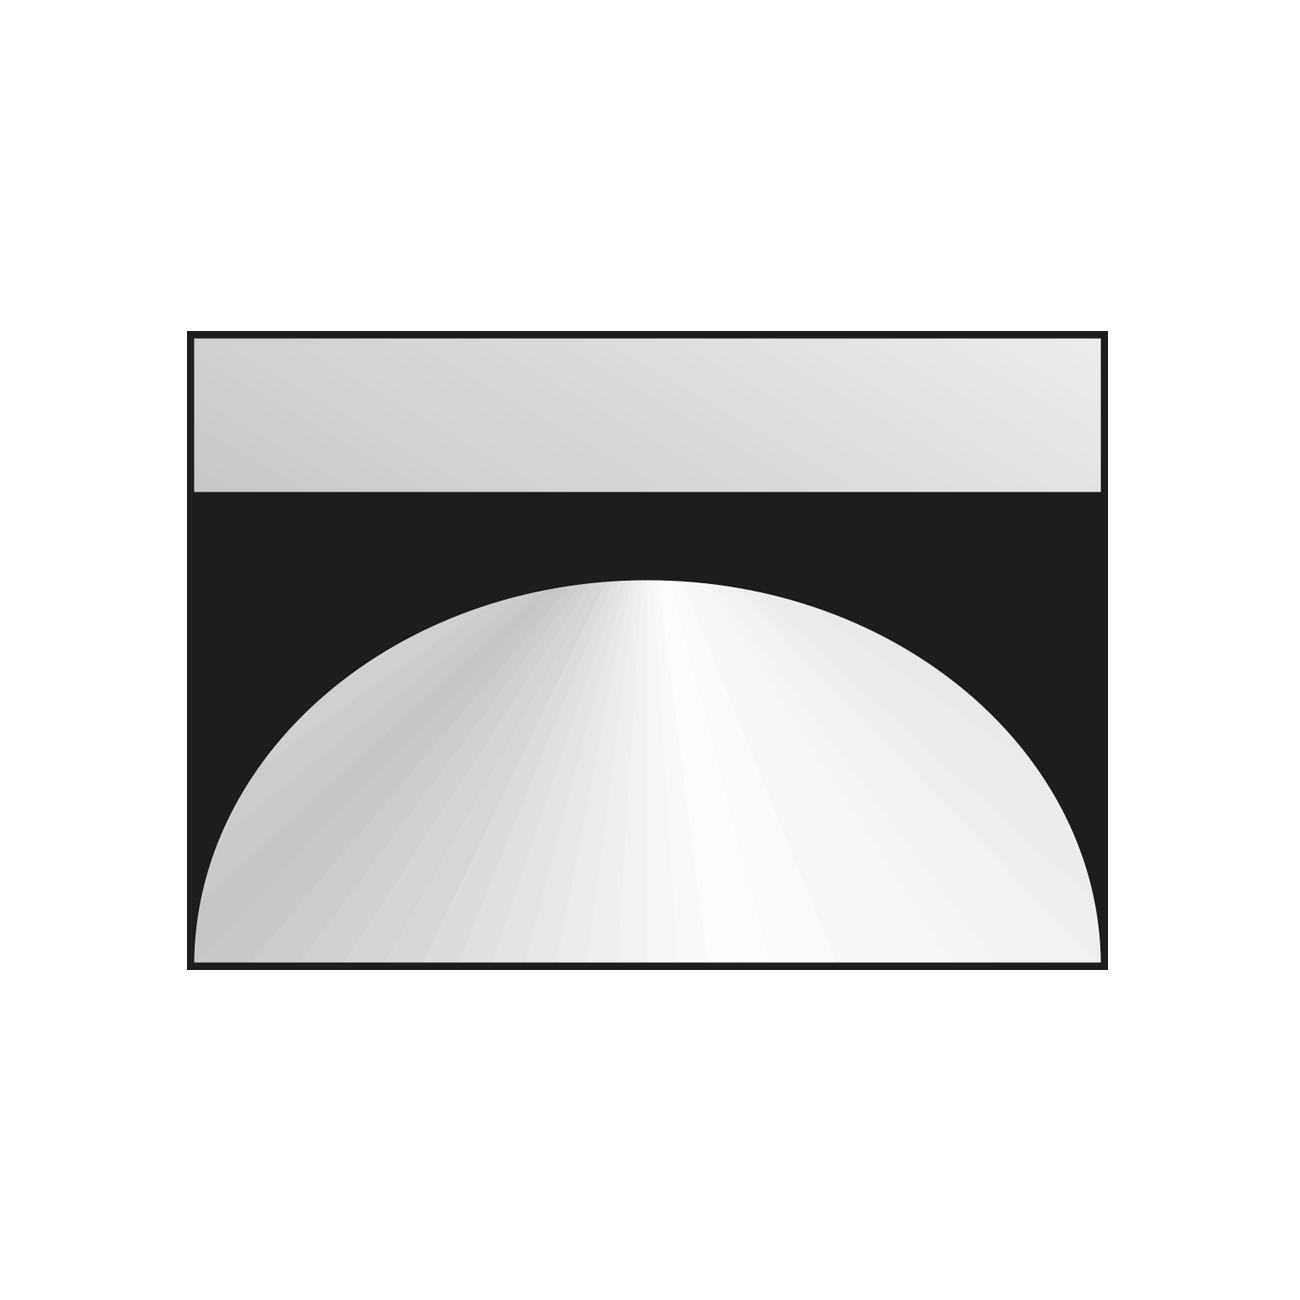 Pana Circulara 6888 Otel Olc45-5x 7.5-19